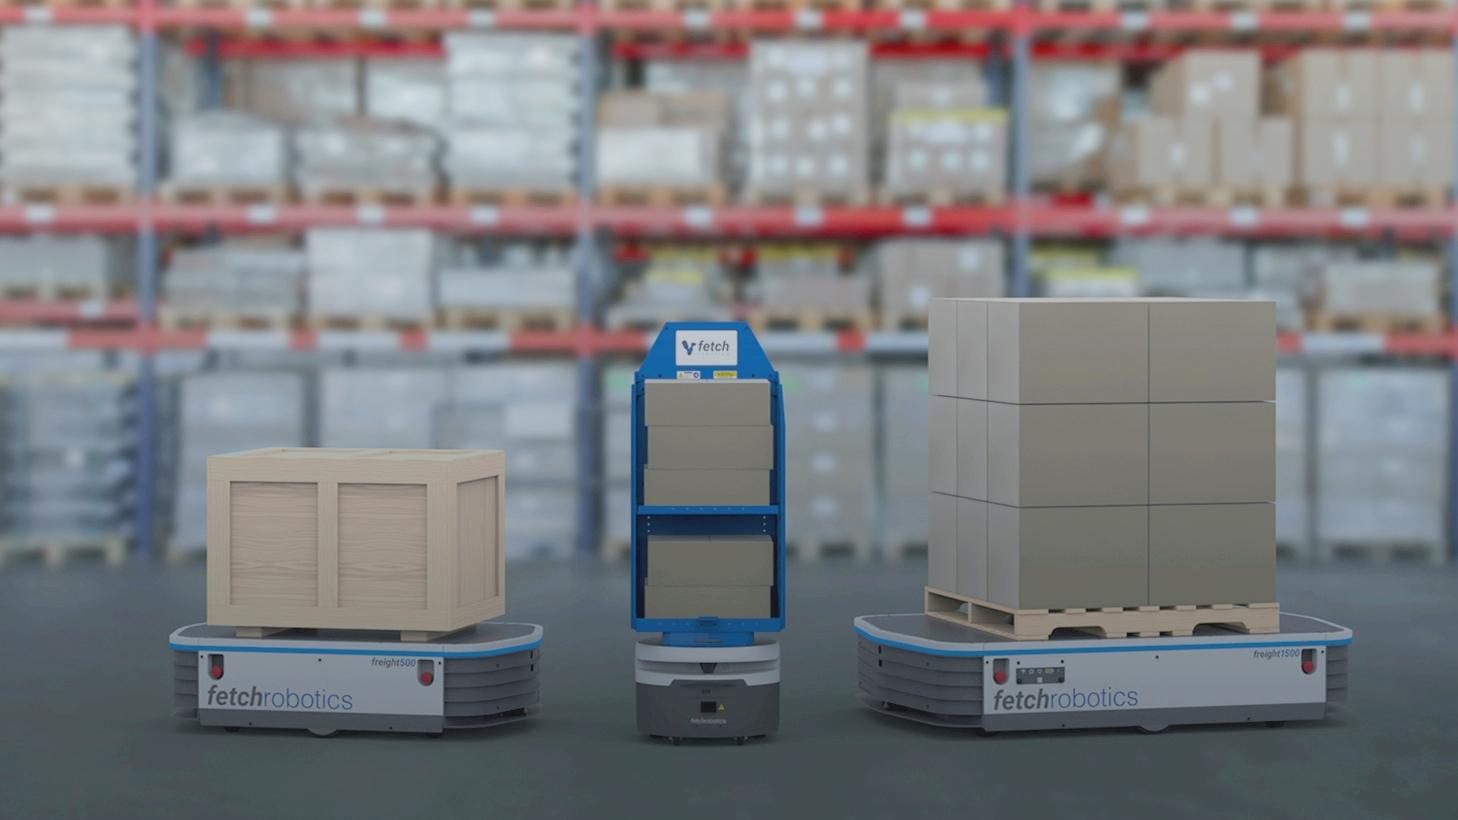 Fetch Robotics raises $25 million to automate warehouses